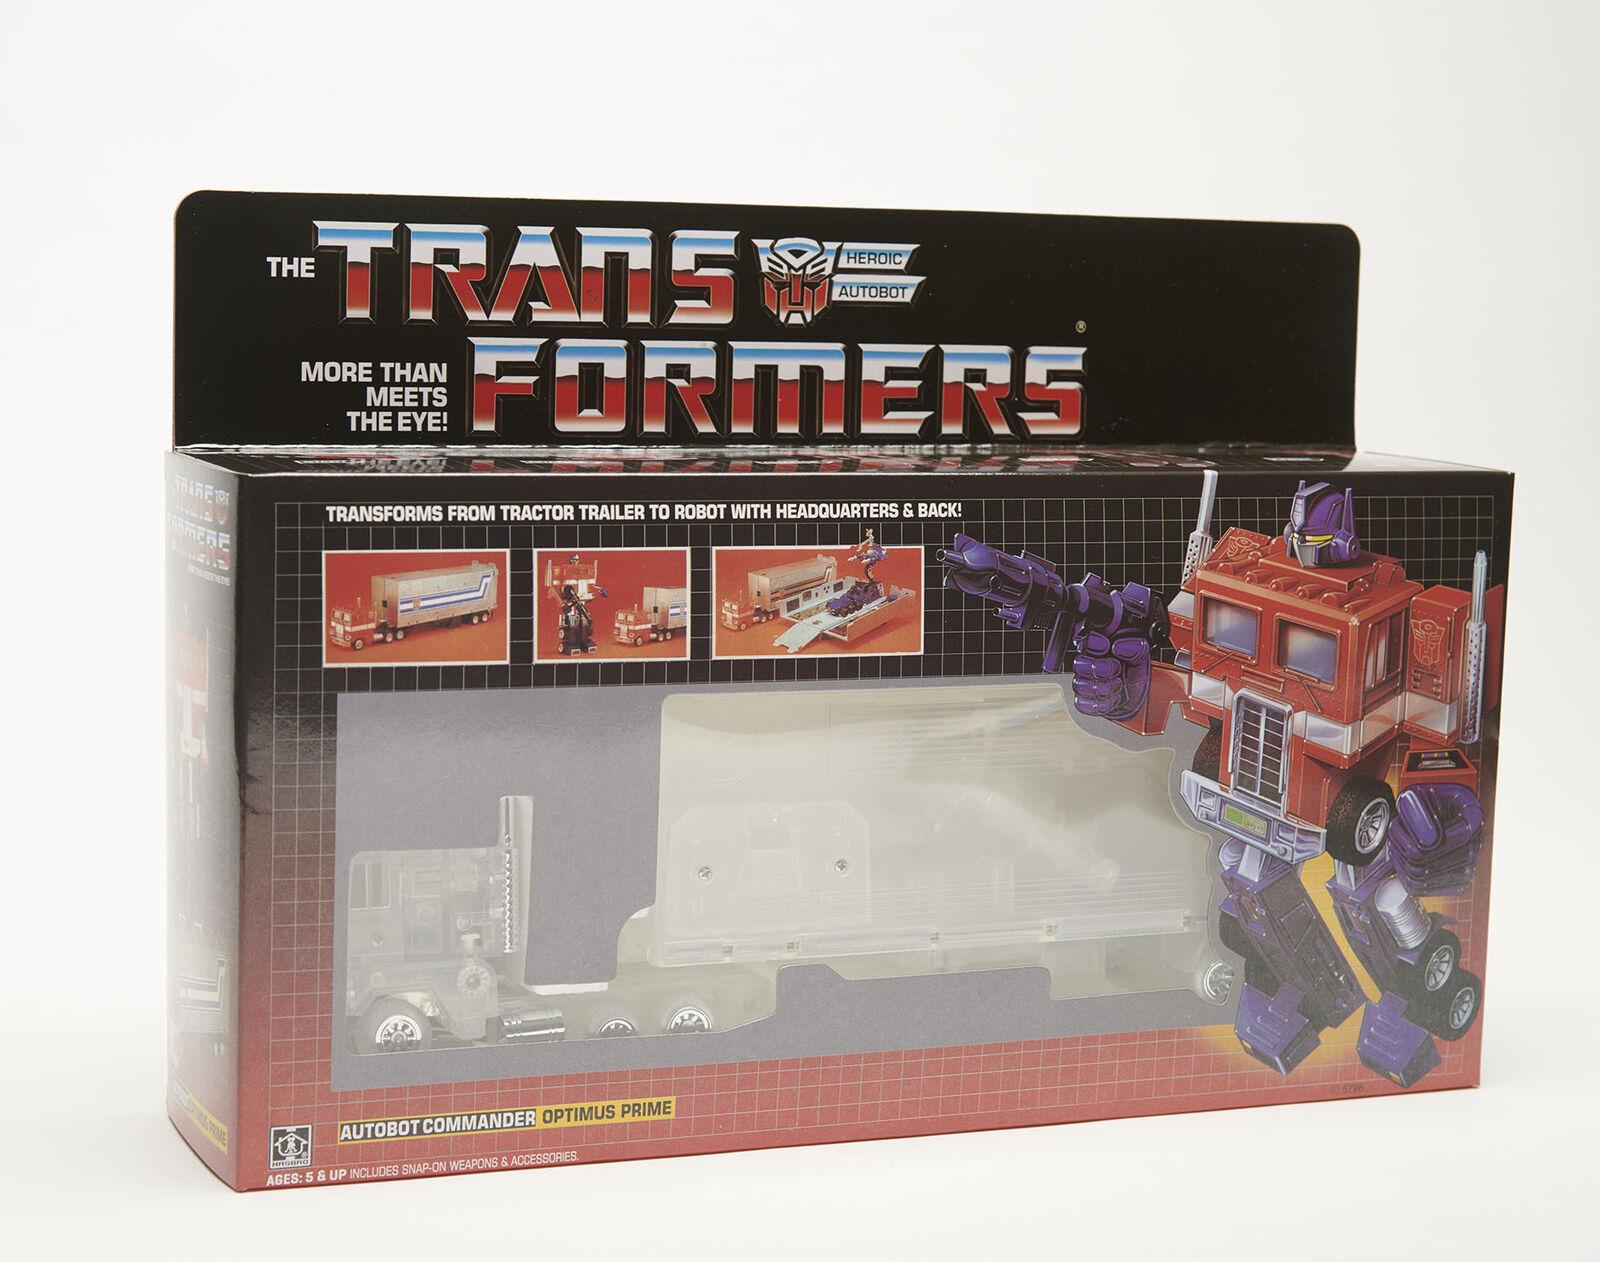 Transformers Optimes Prime G1 transformers Reissue Transparent Version Version Version Toys Hot 3c8c8a